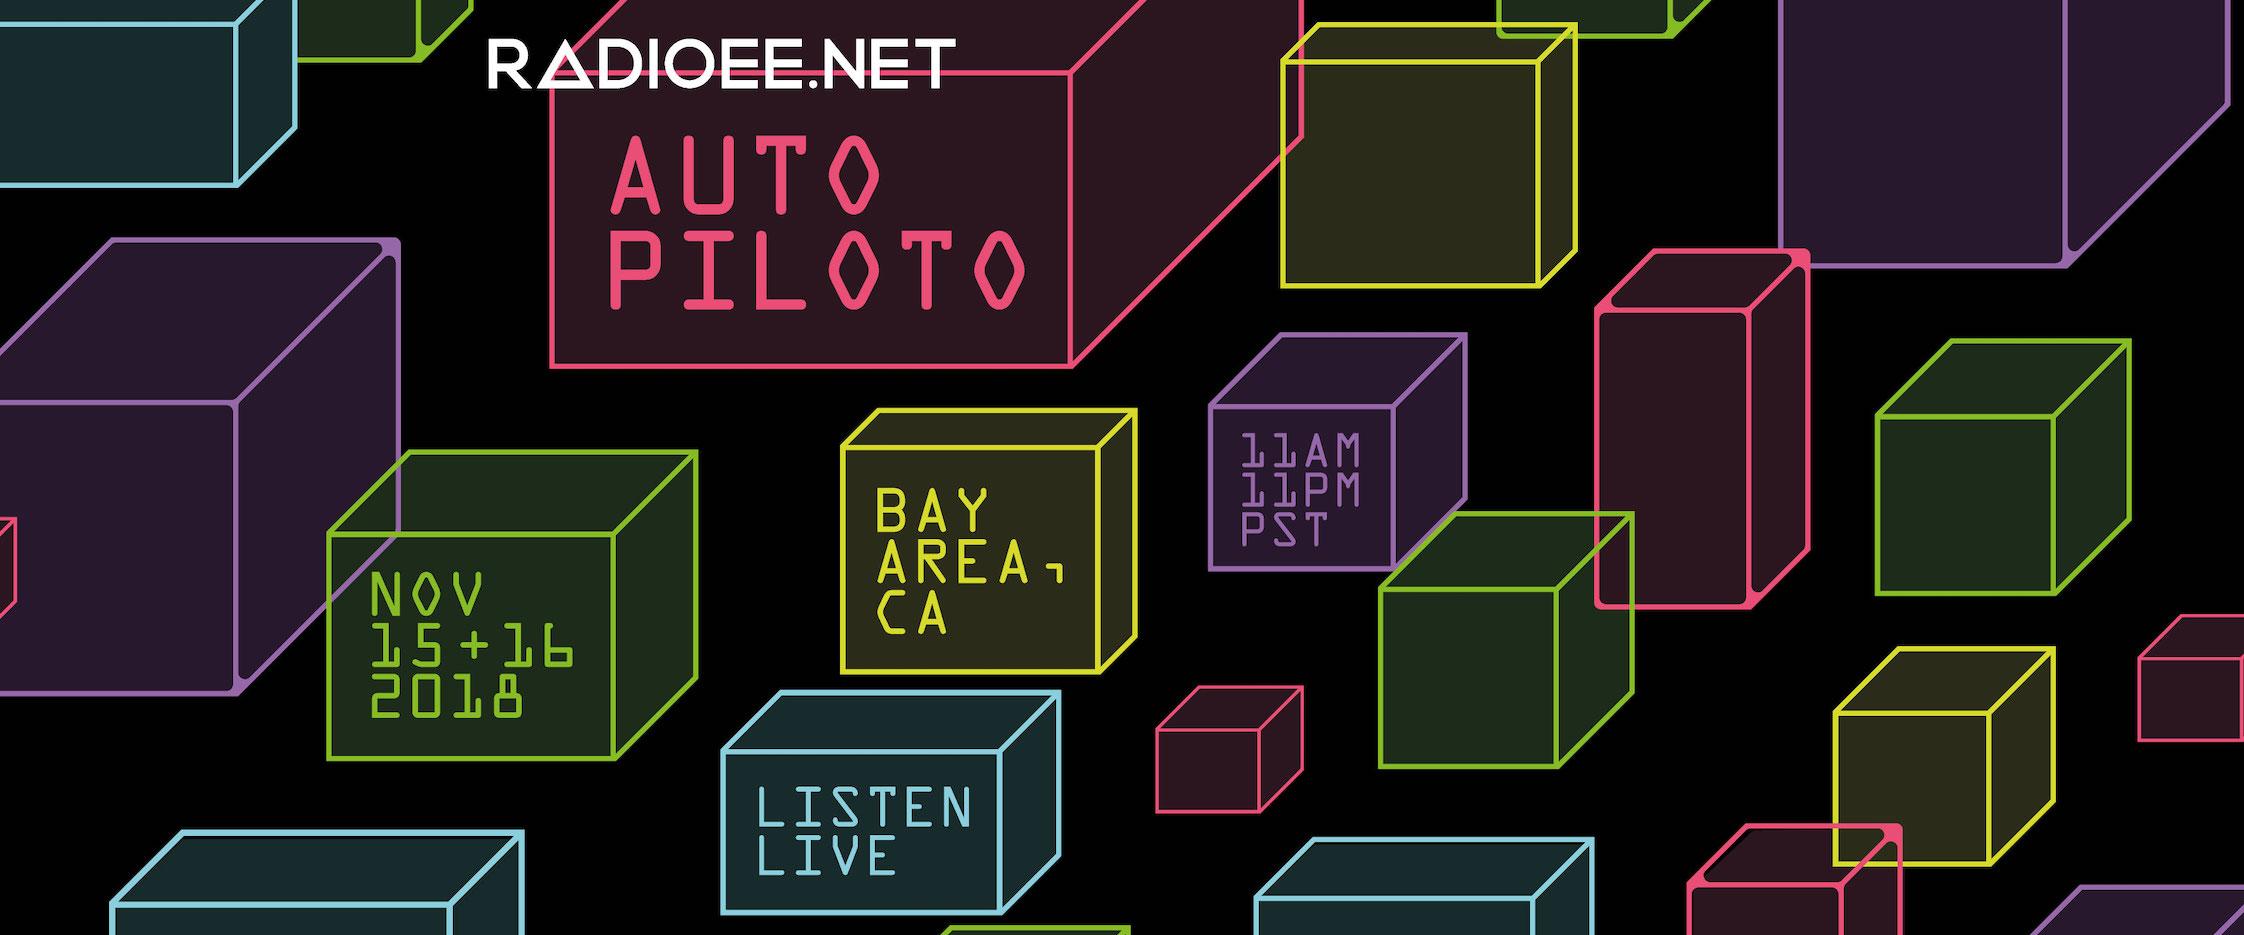 AUTOPILOTO by RadioEE.Net: Tune In November 15-16